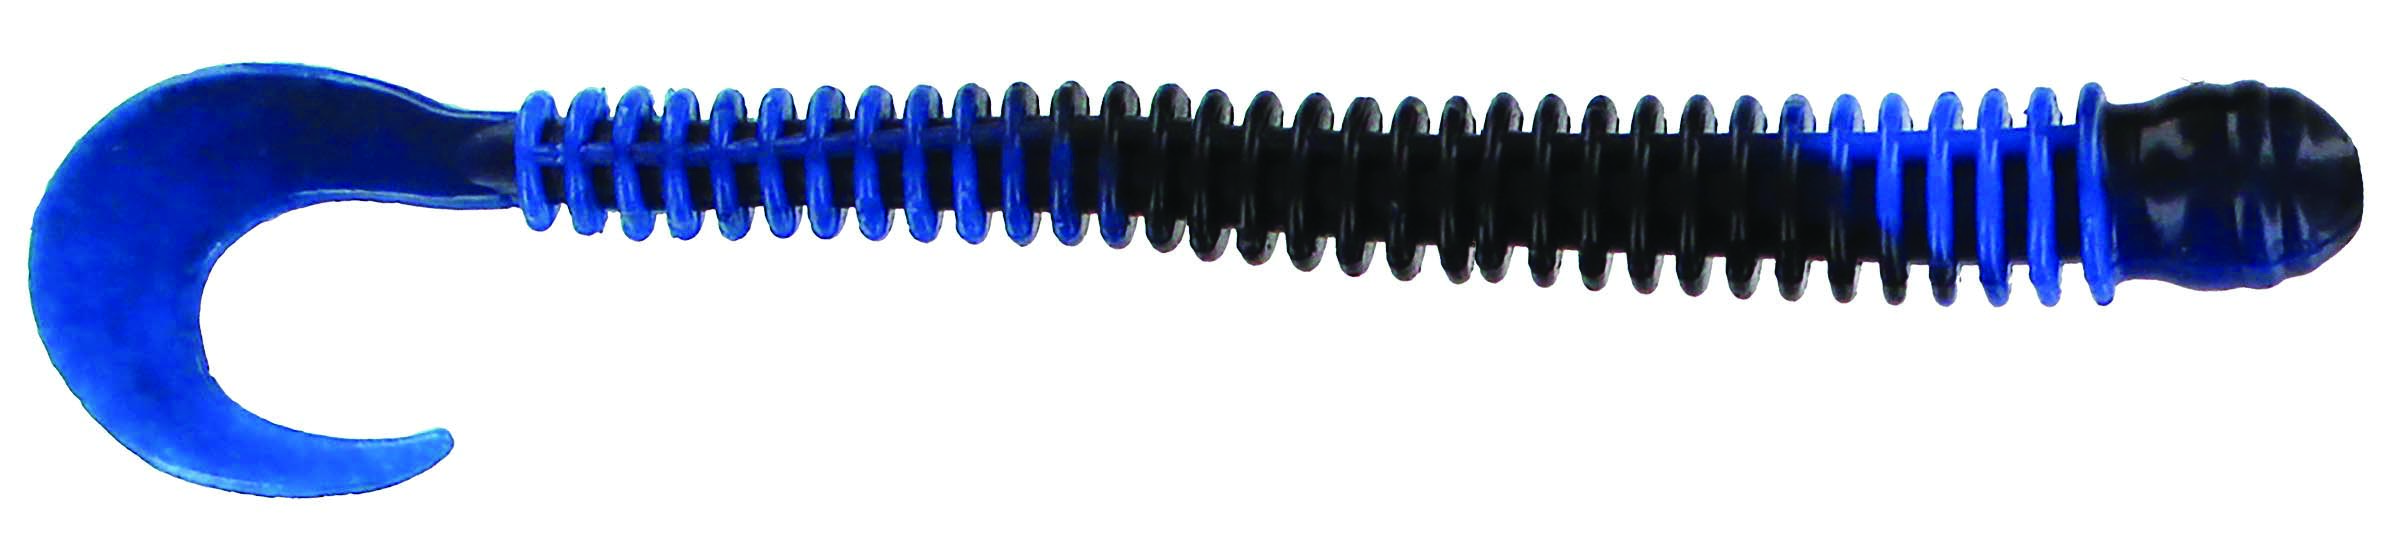 Big Bite Baits - Disc Ring Worm - 4 inch - RW-402 - BLACK BLUE SWIRL